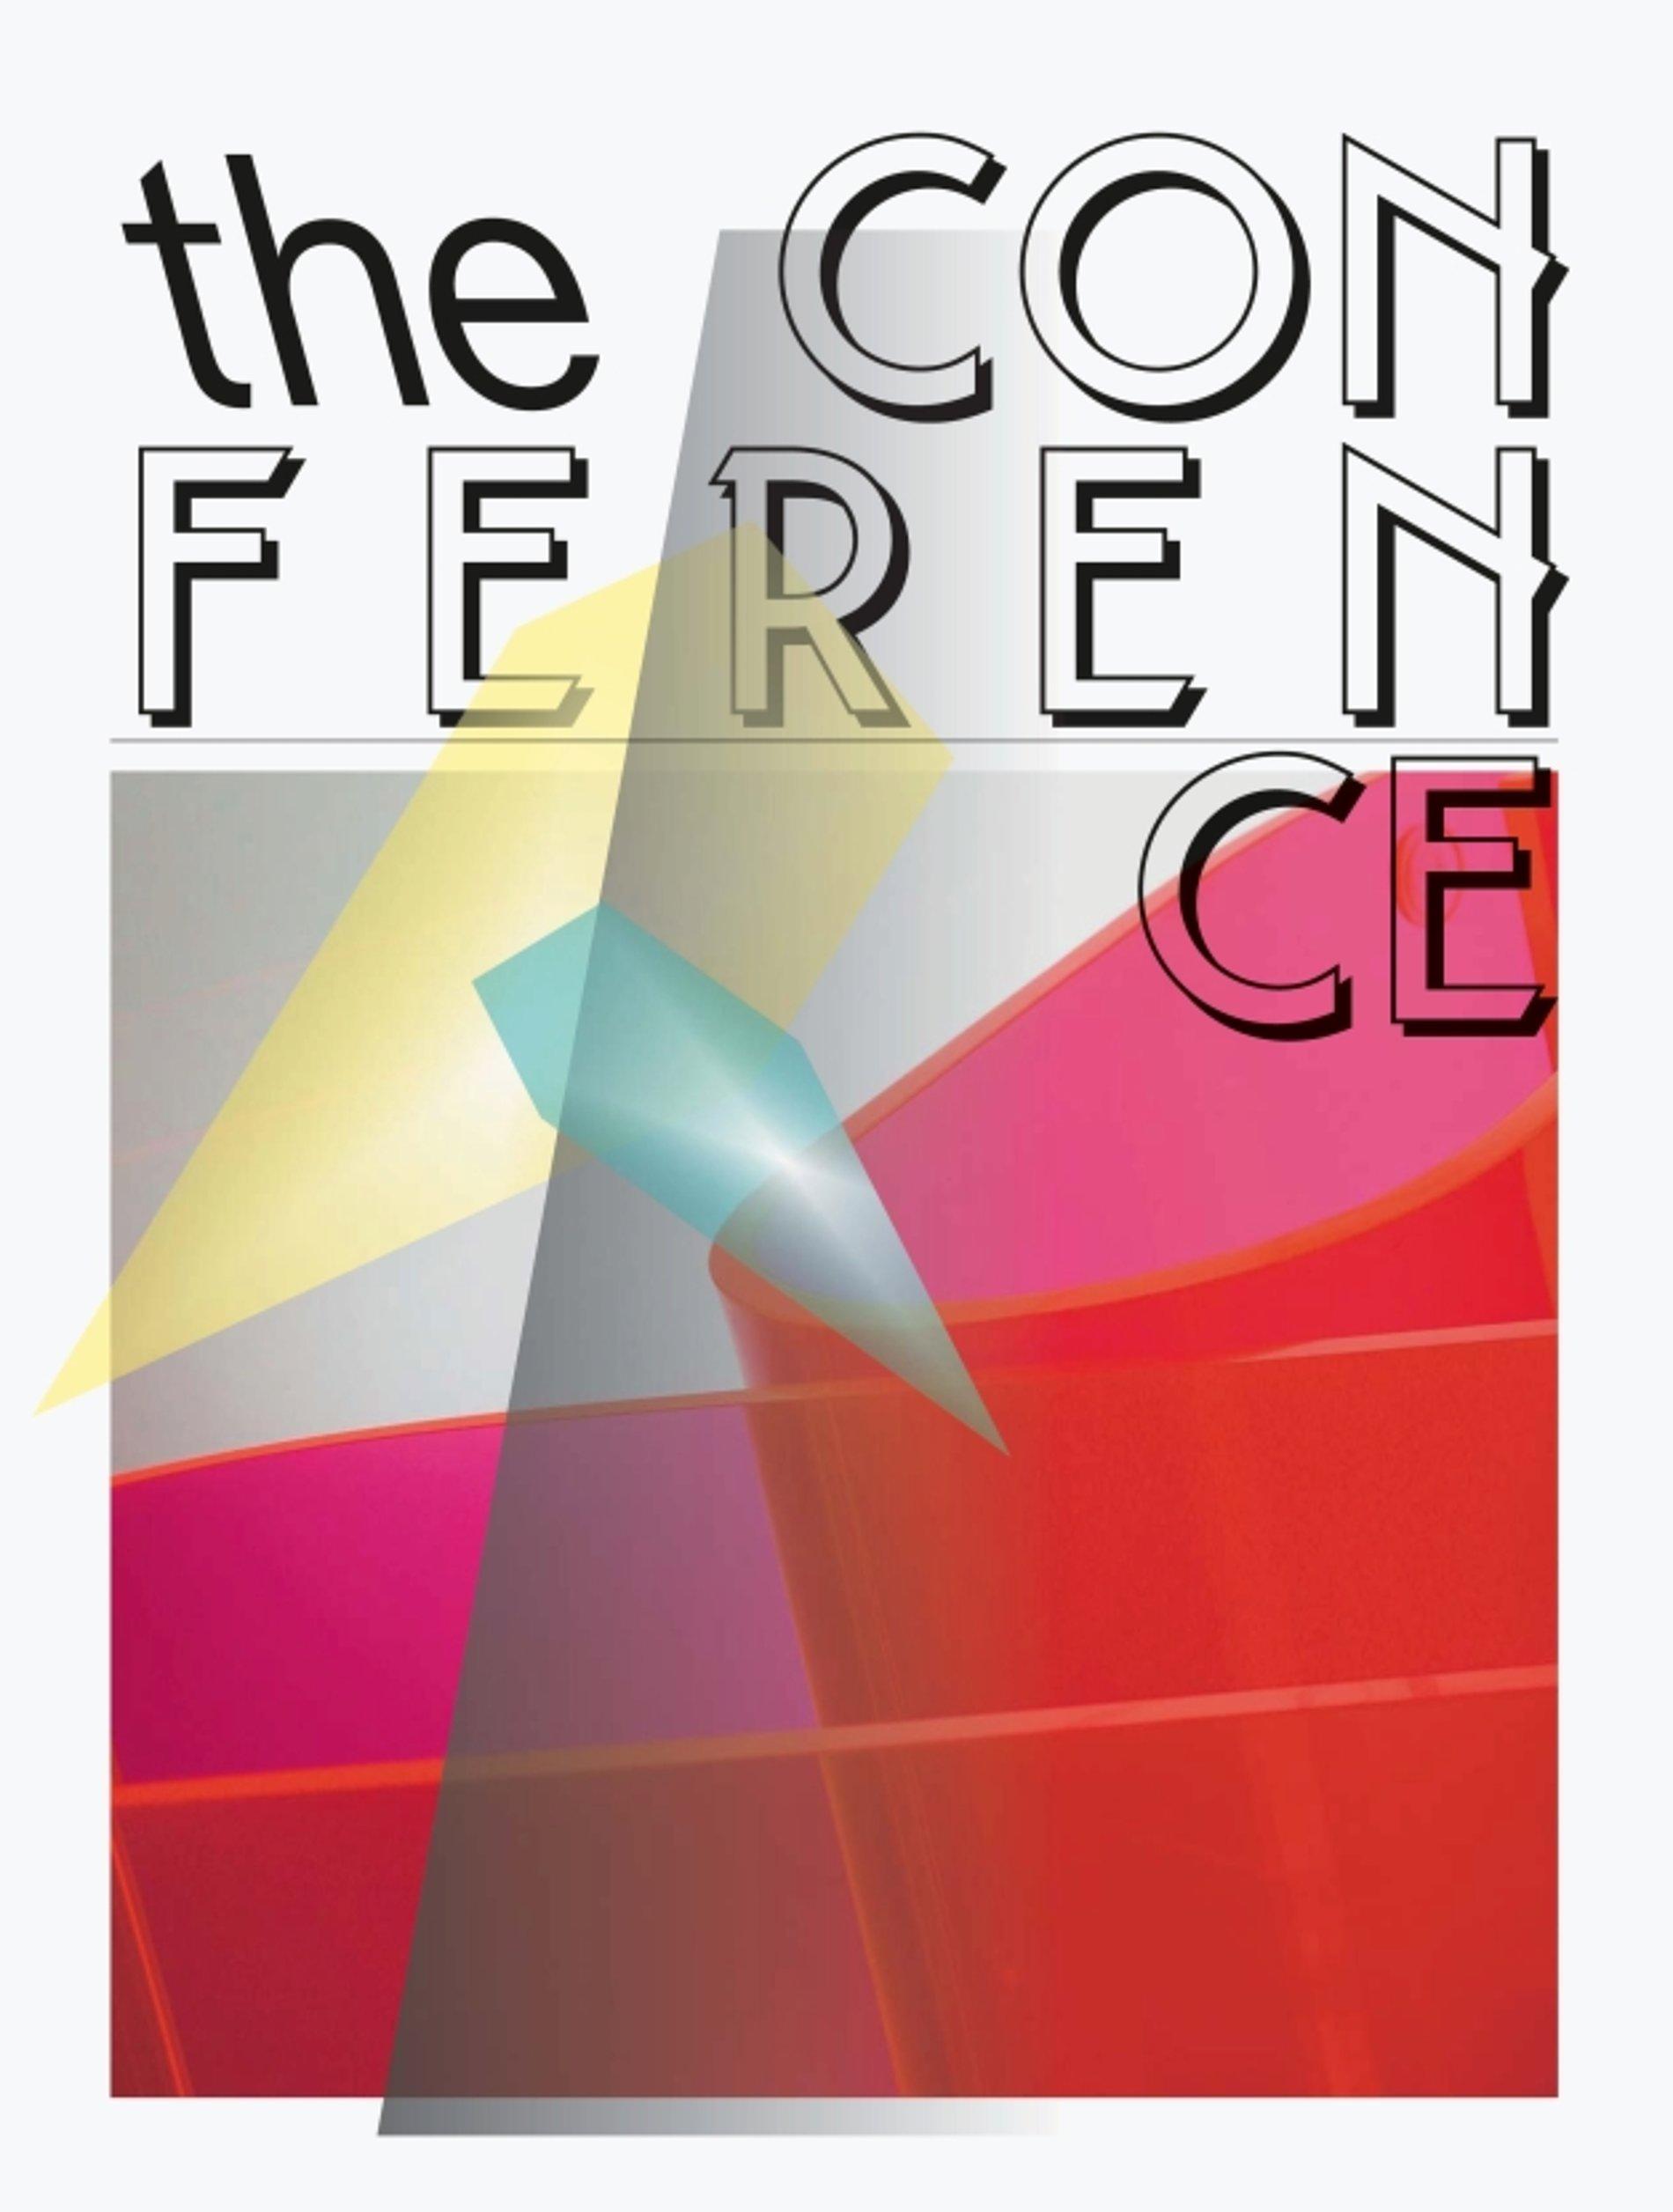 Audi Urban Future Award – The Publications | Red Dot Design Award